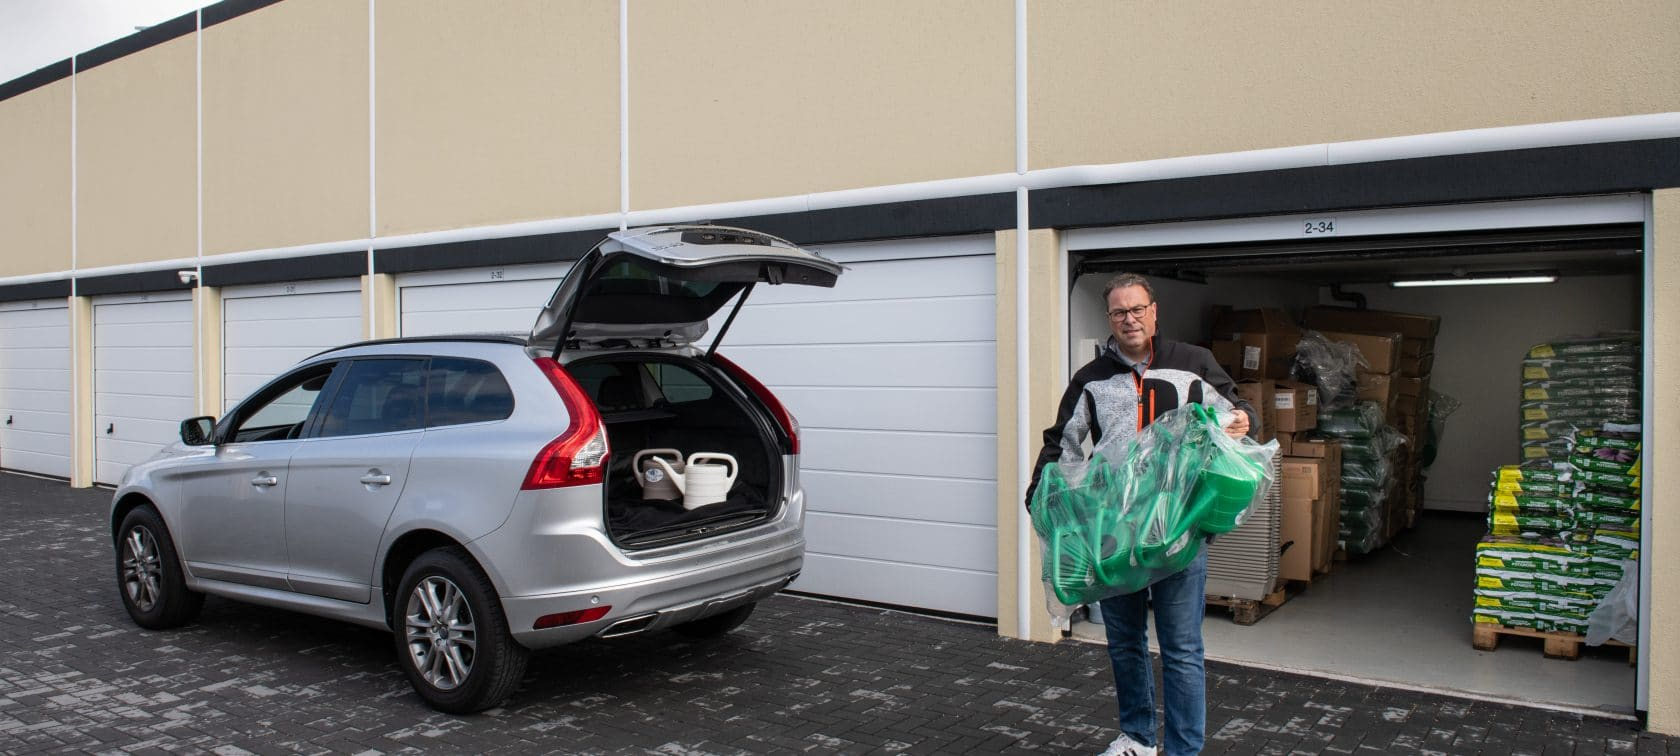 winkelvoorraad opslag garagebox - GaragePark